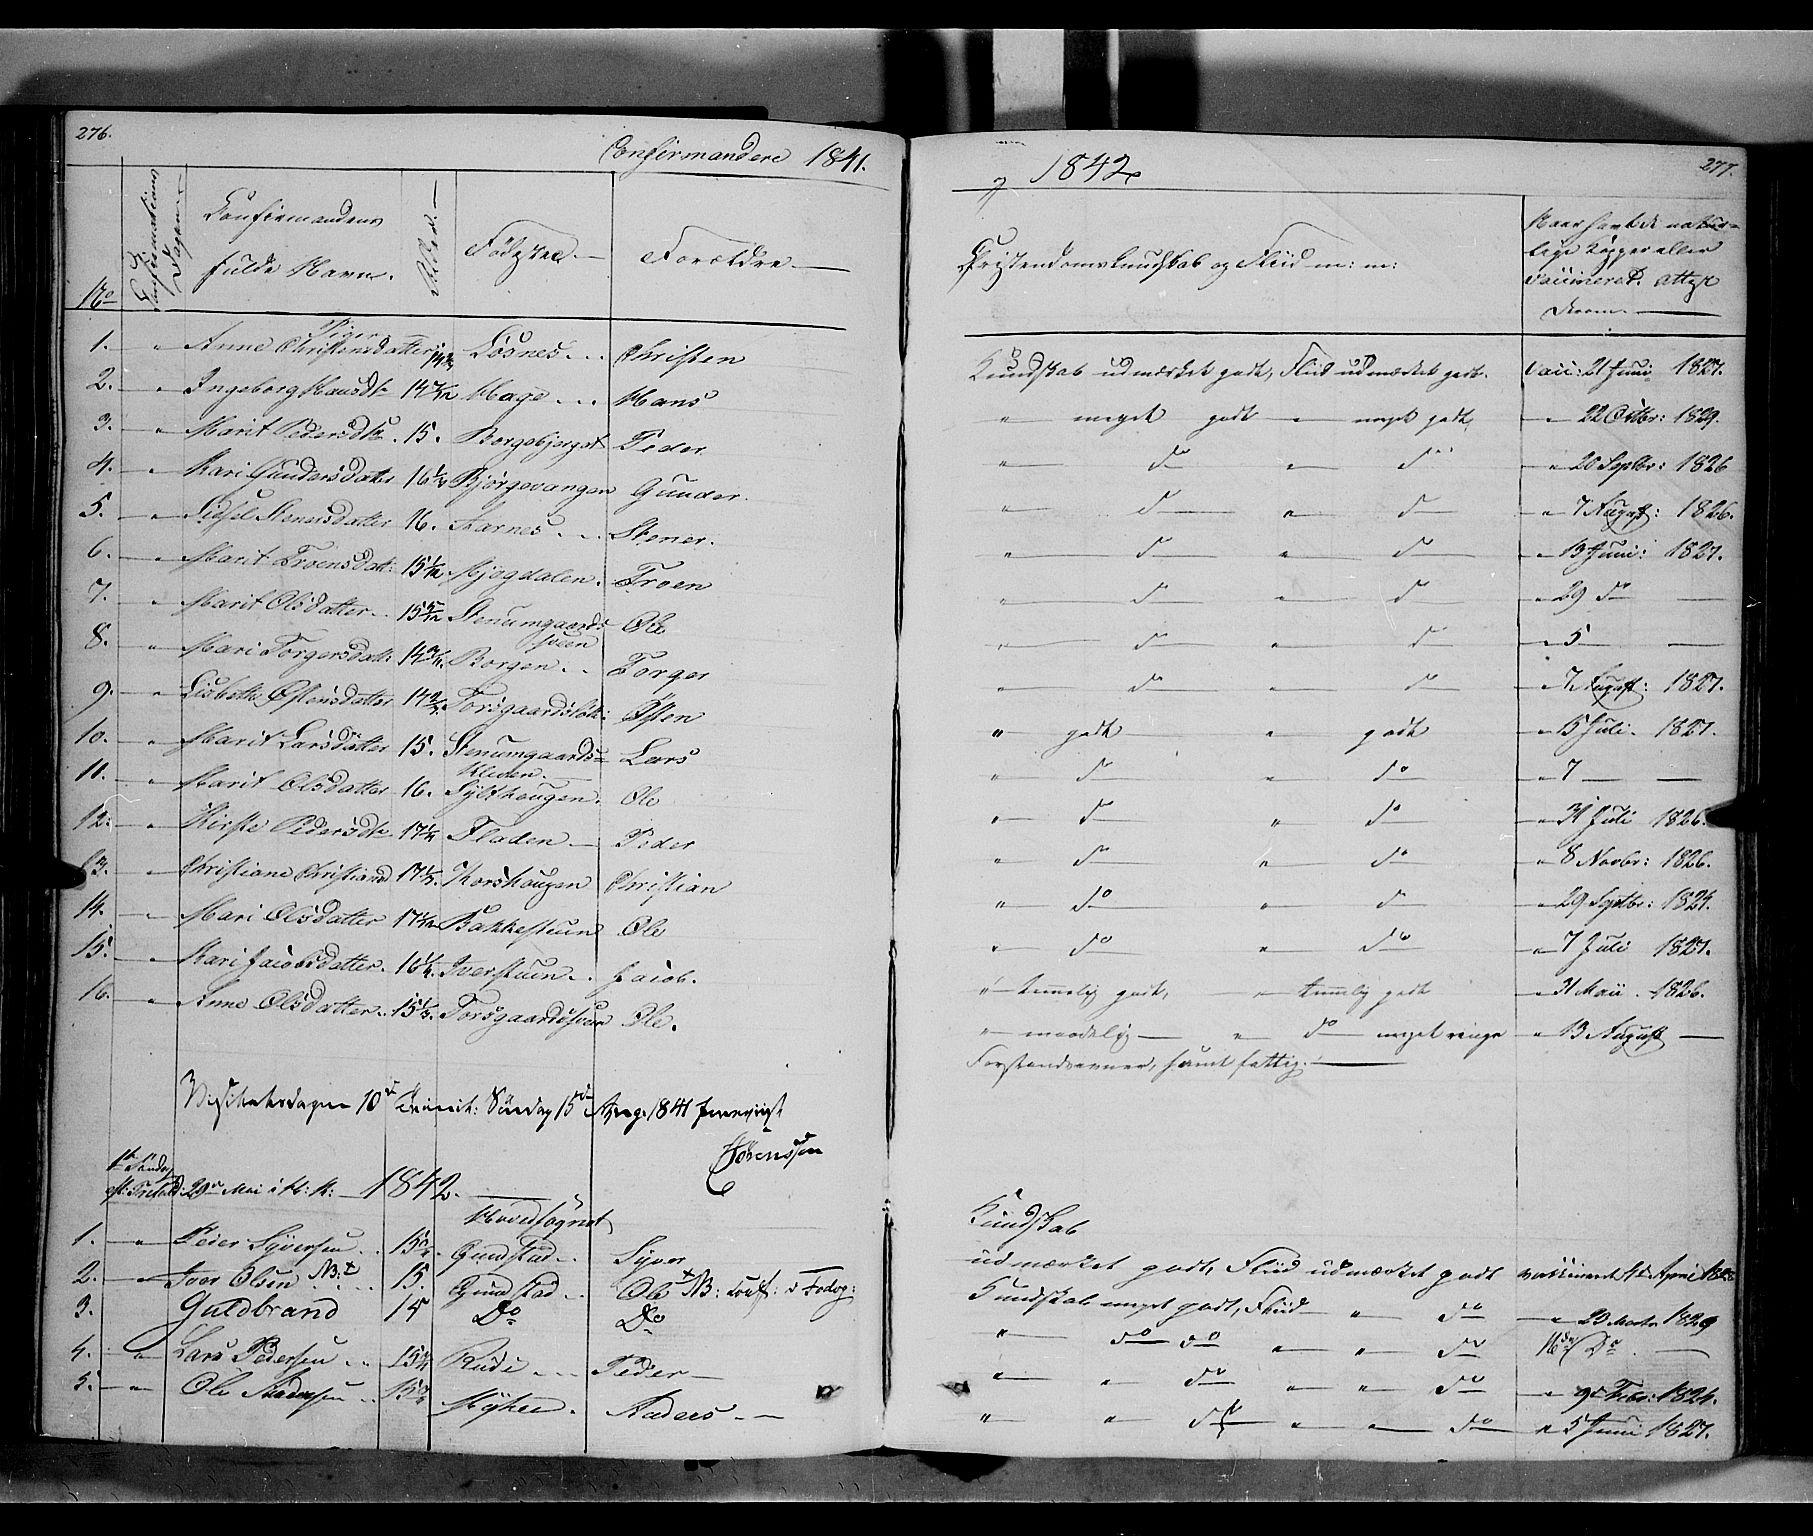 SAH, Ringebu prestekontor, Ministerialbok nr. 5, 1839-1848, s. 276-277